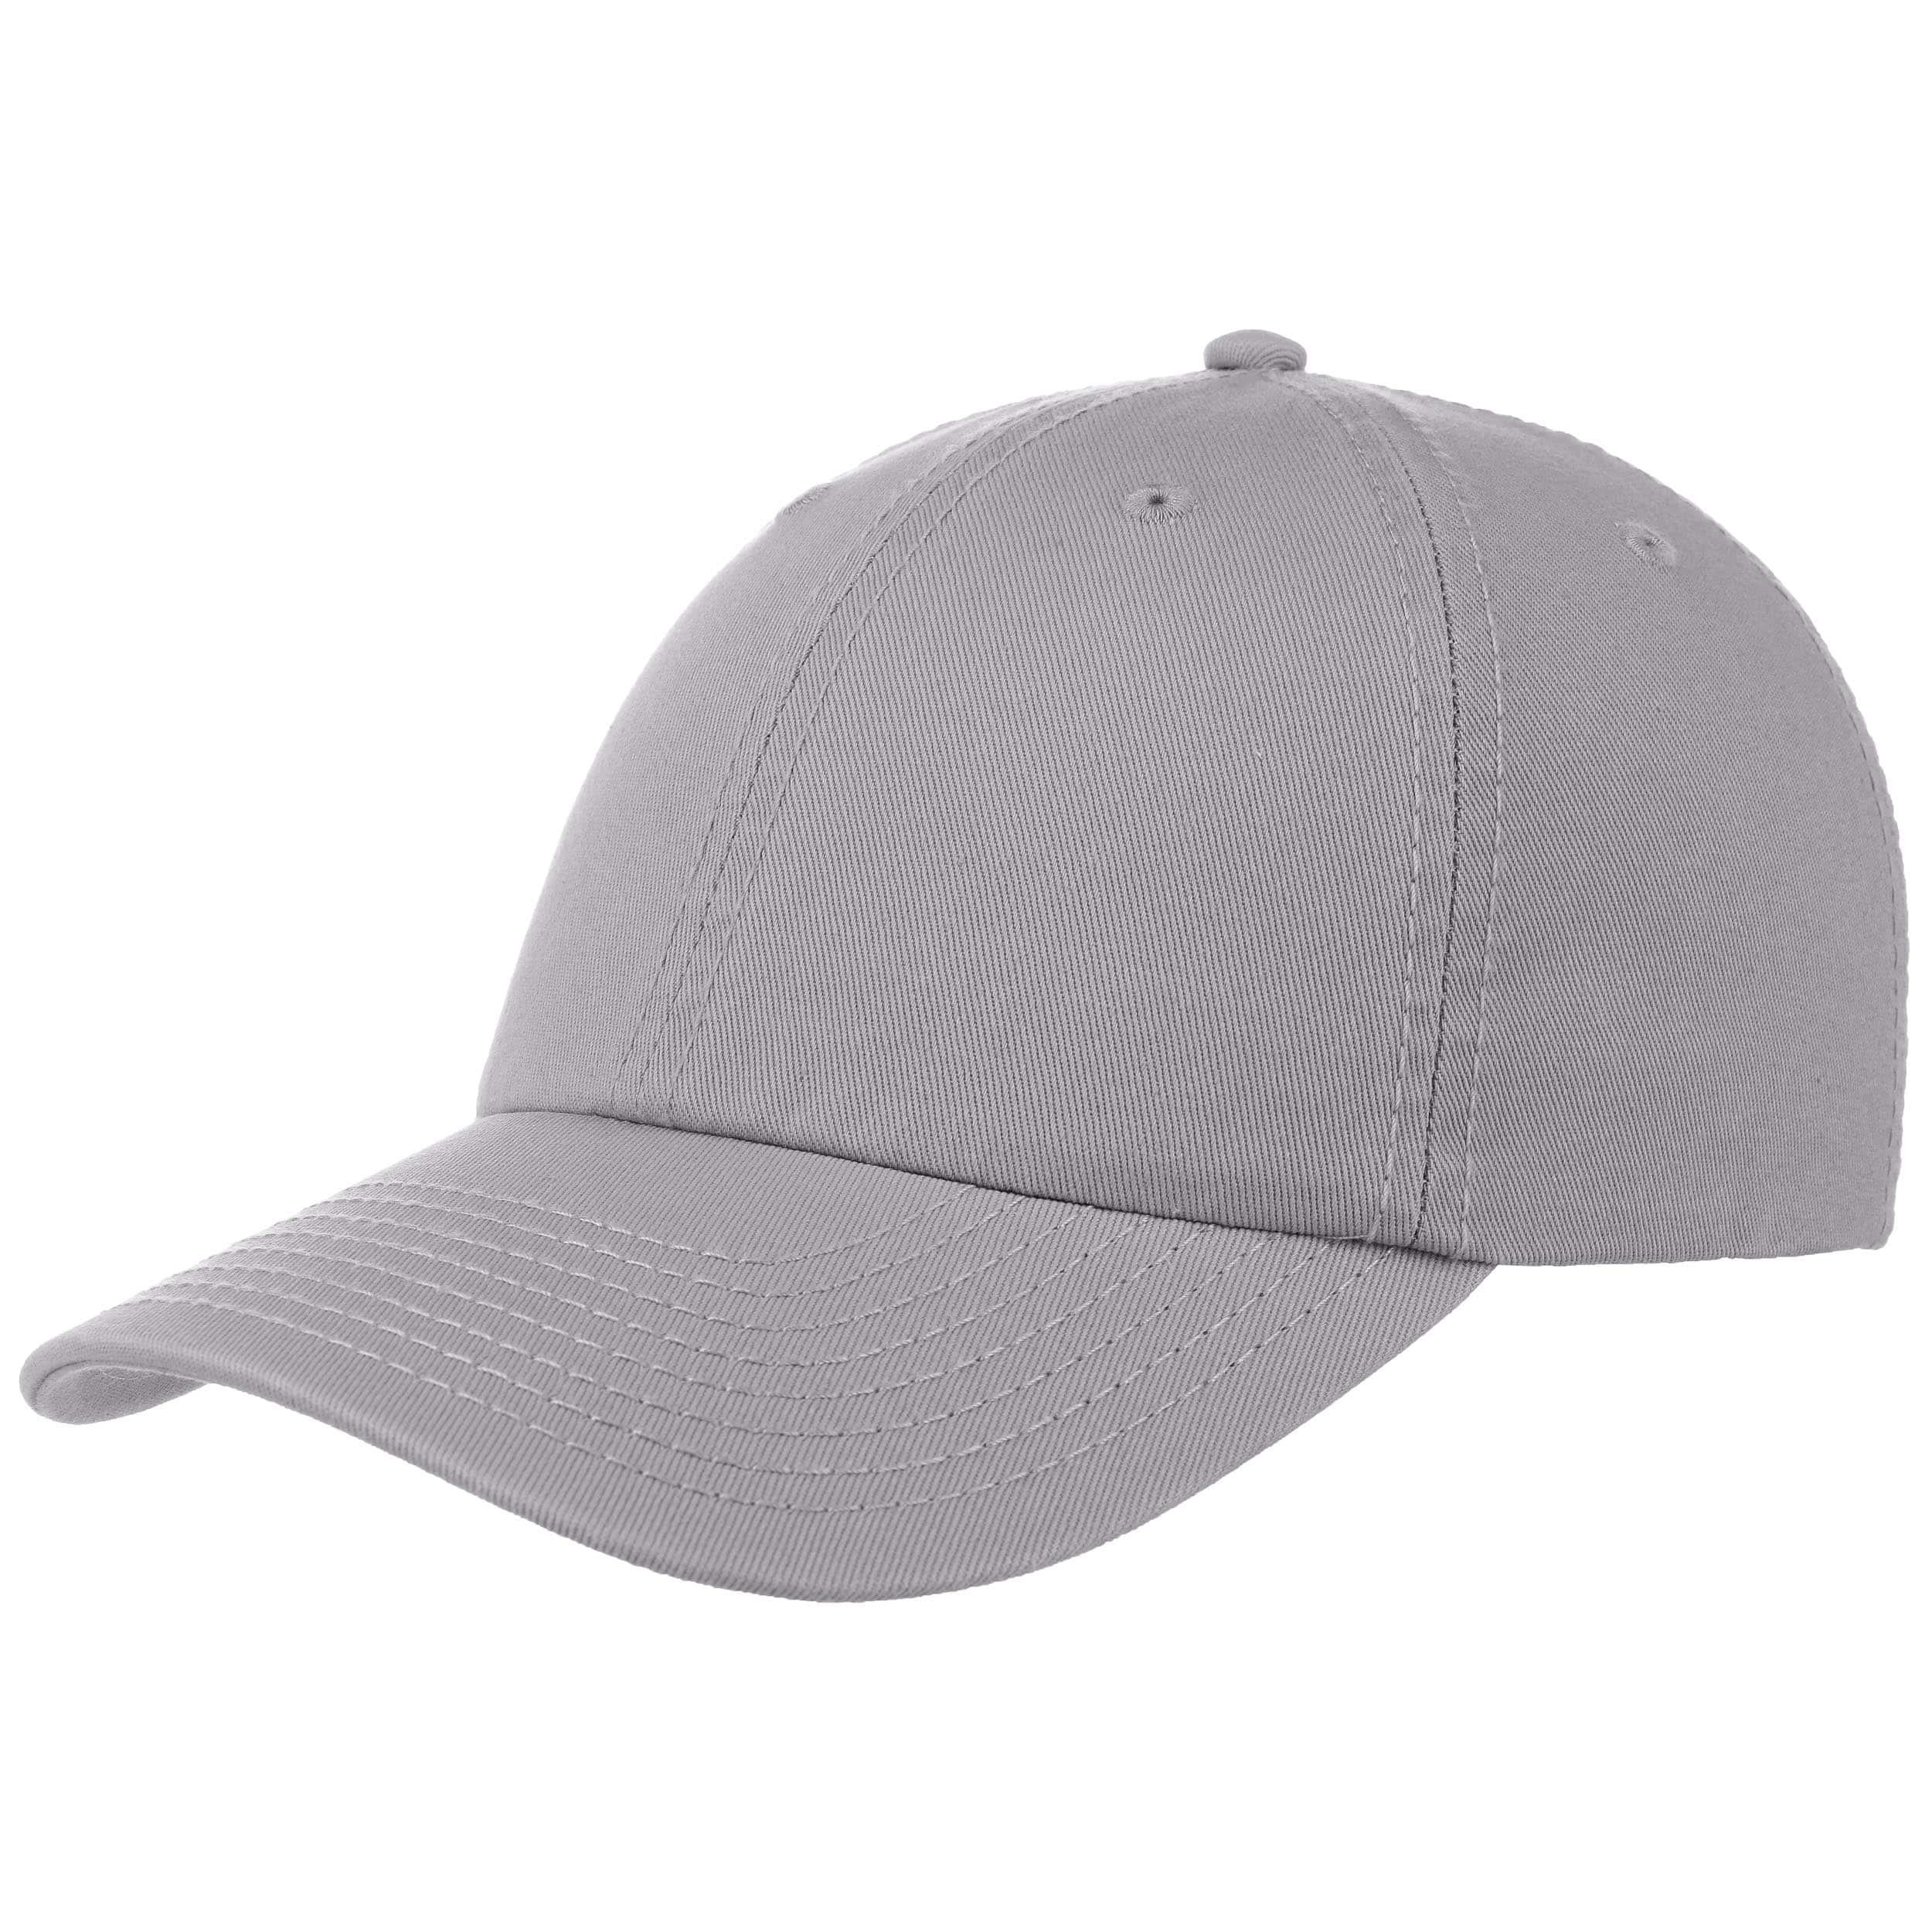 929ecf7a ... Dad Hat Strapback Cap - light grey 5 ...